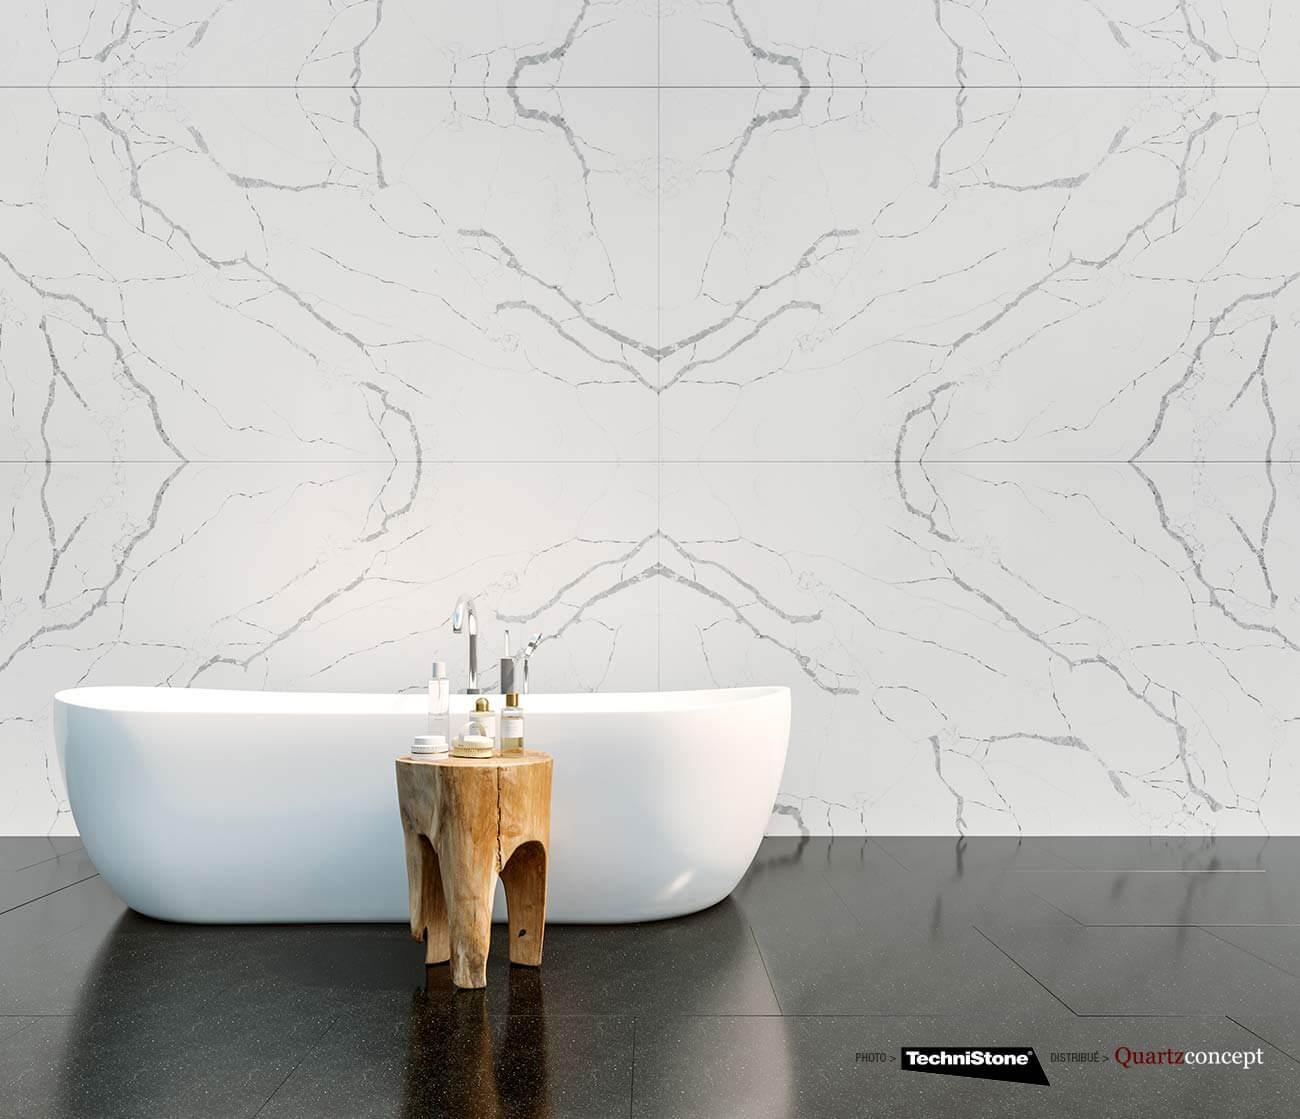 couleur-Callacatta-SILVA Quartz Technistone | Comptoir de cuisine et salle de bain